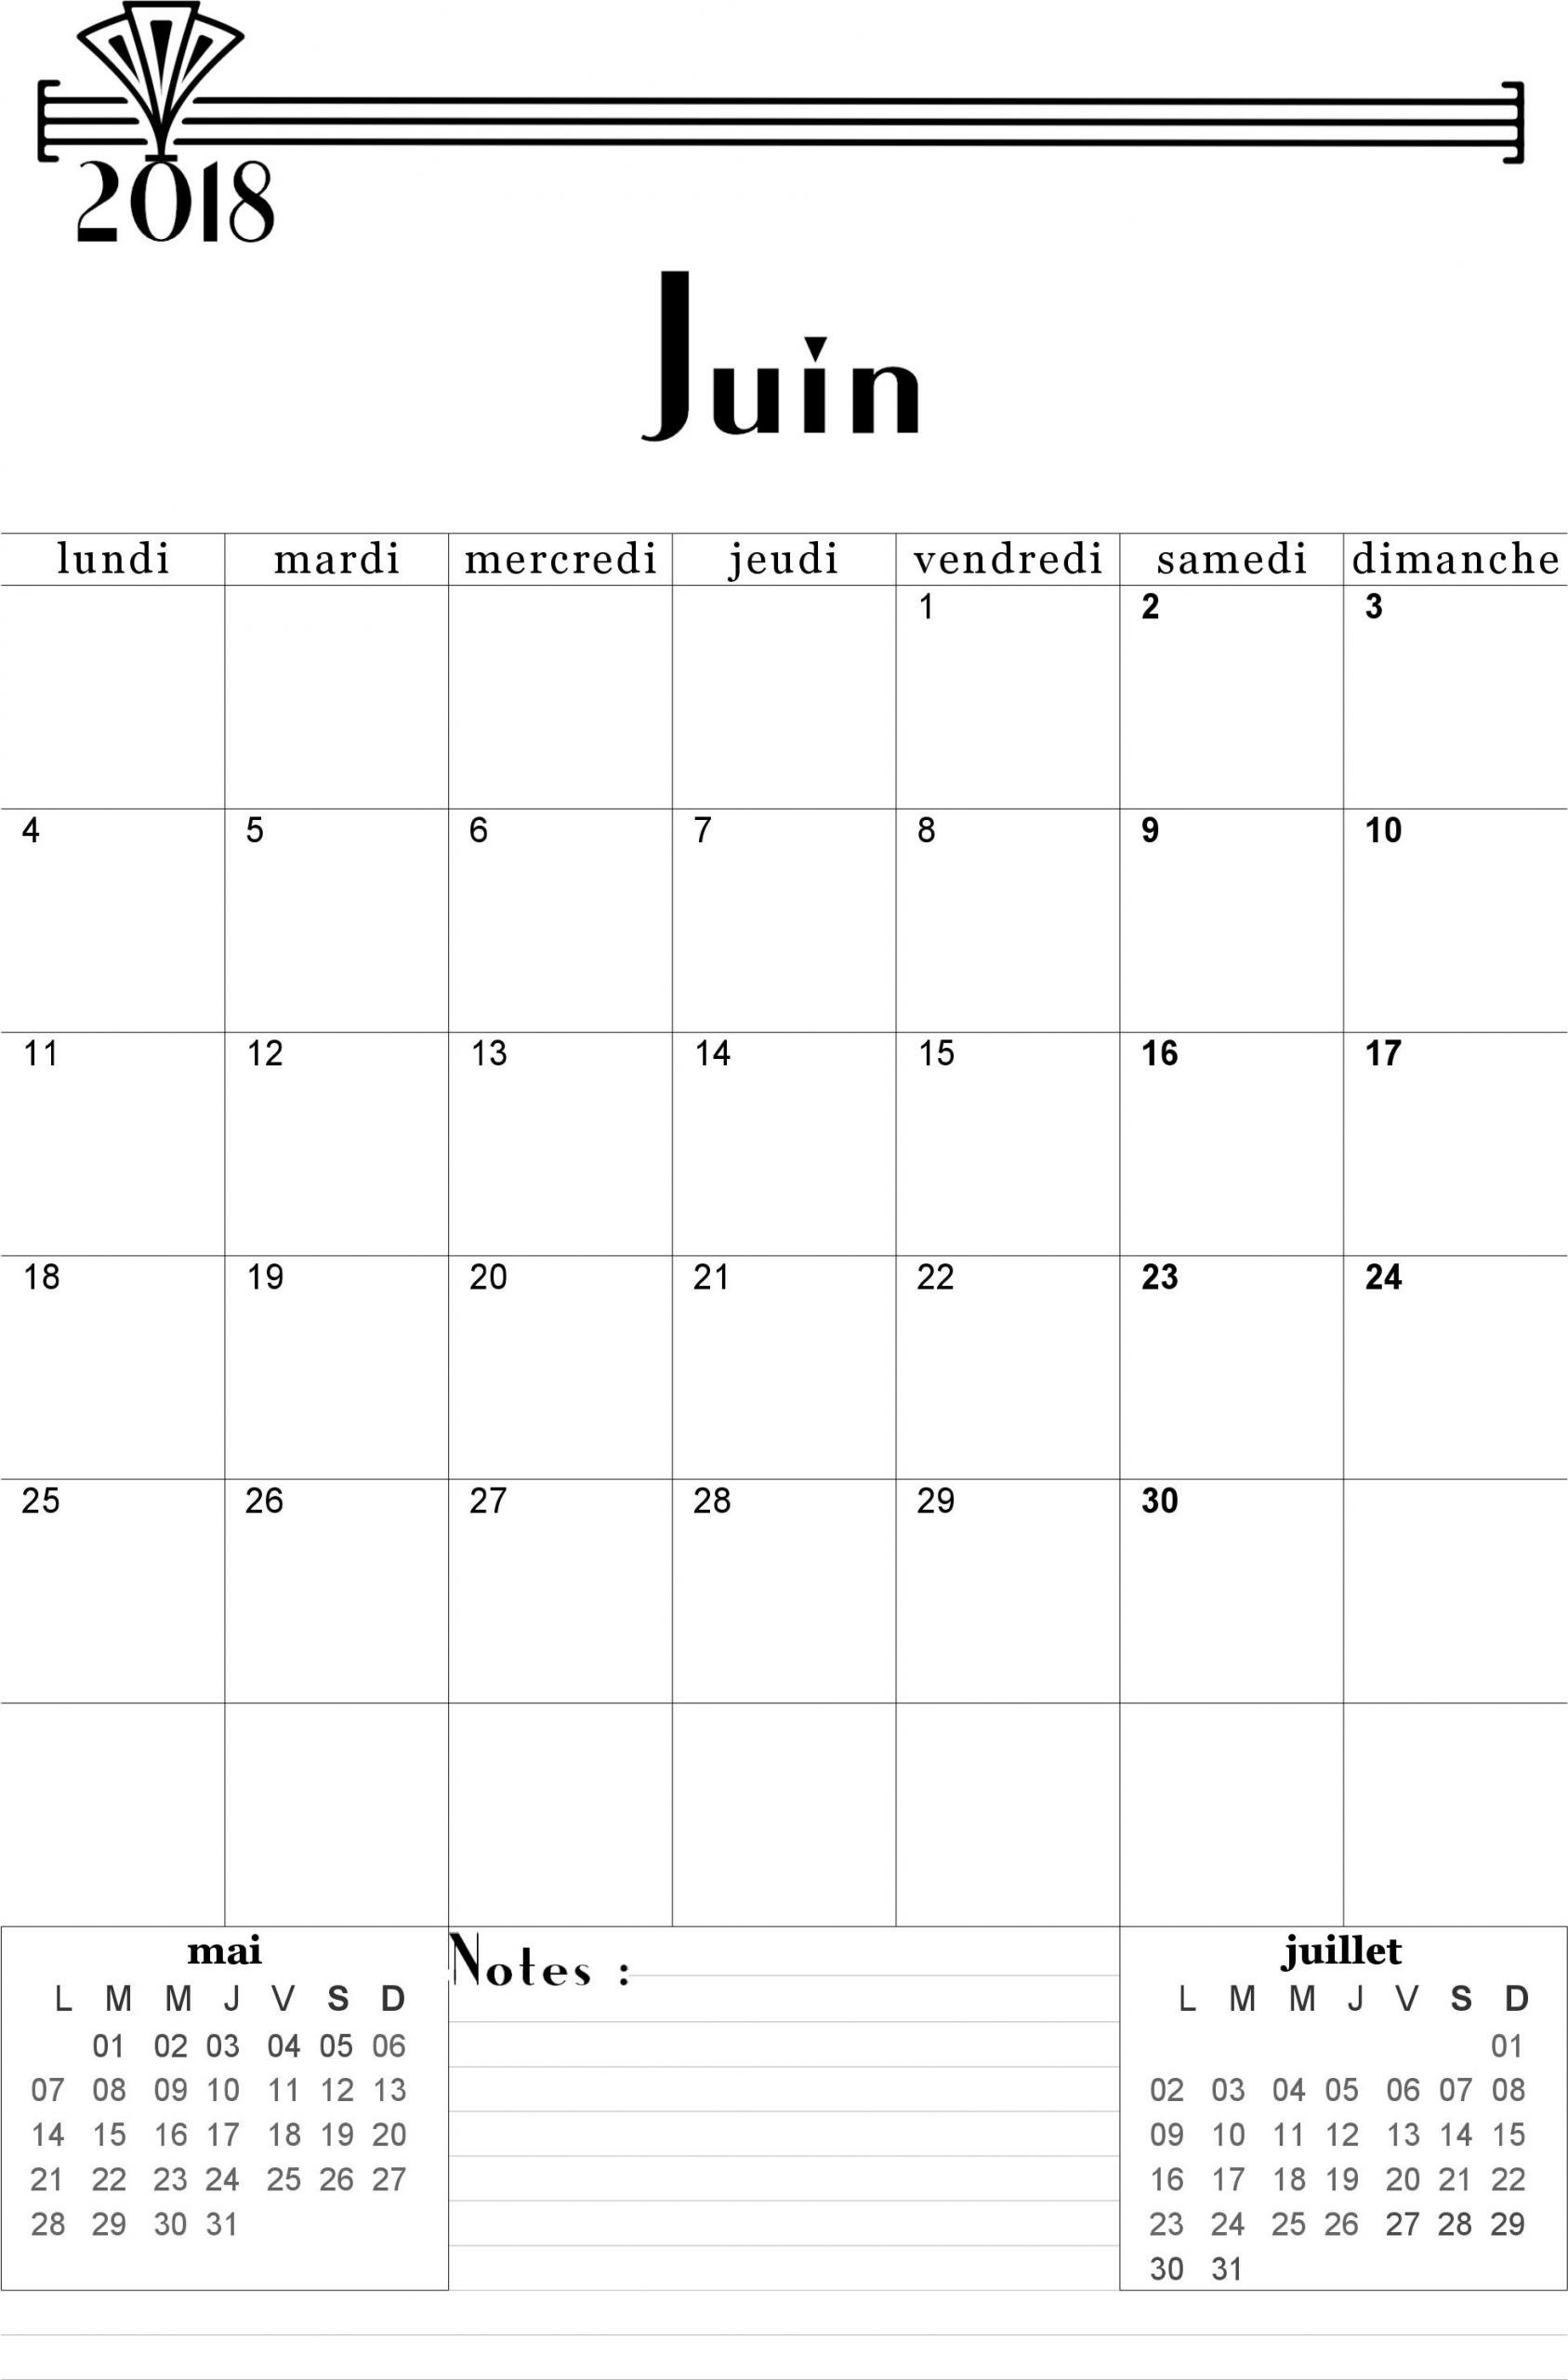 Calendrier Juin 2018 À Imprimer. | Calendrier, Calendrier tout Calendrier Annuel 2018 À Imprimer Gratuit